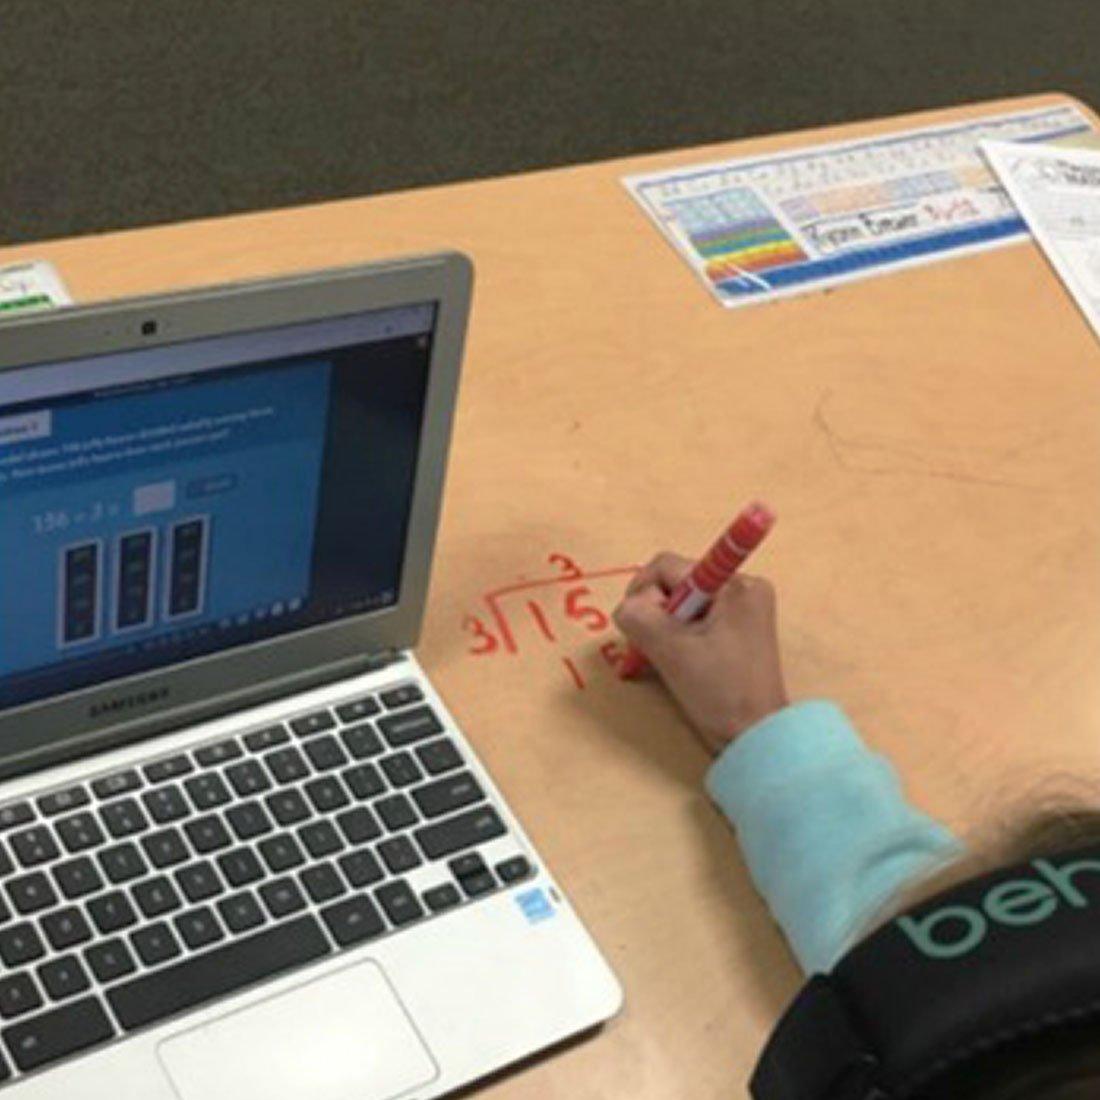 student-solving-math-problem-on-desk-in-expo-marker.jpg